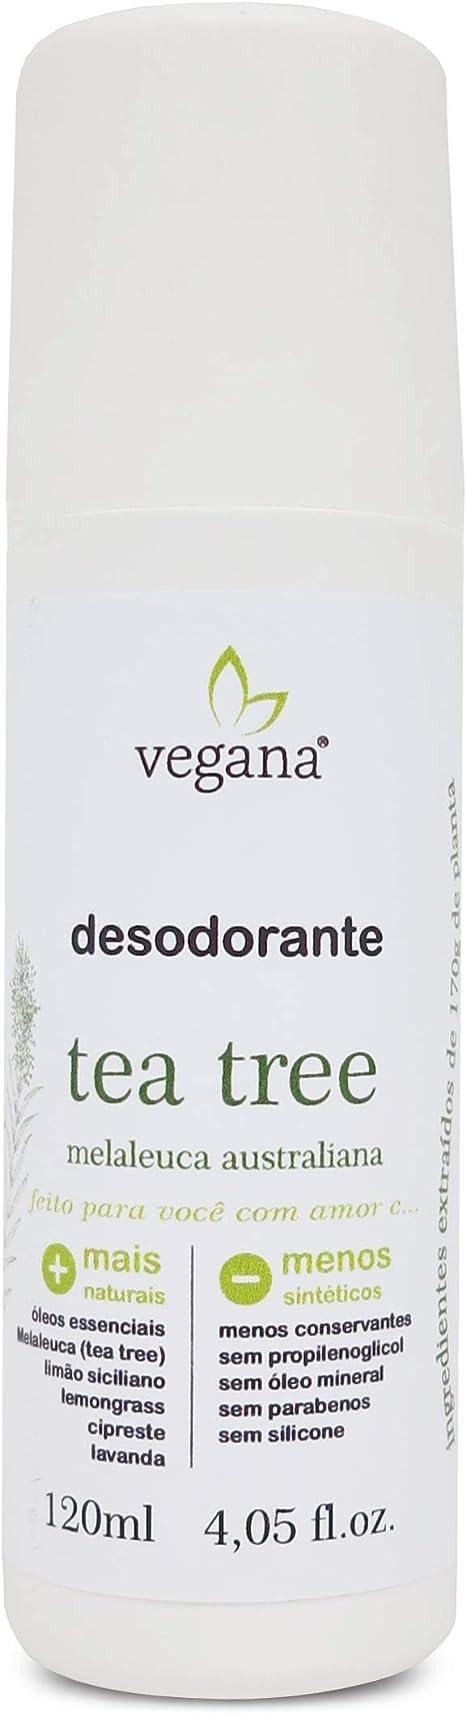 Vegana Desodorante Corporal Tea Tree 120ml, Vegana: Amazon.com.br: Beleza